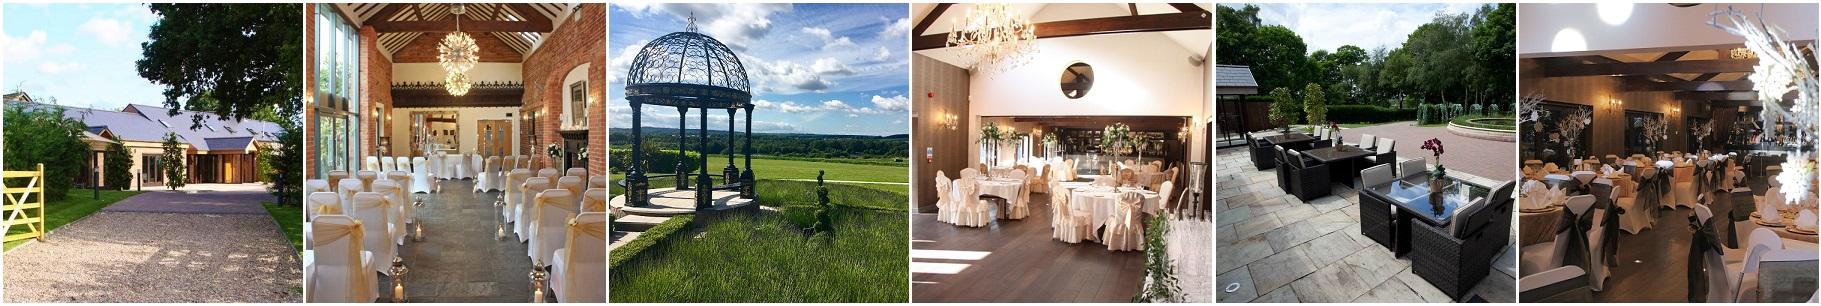 Goosedale Photos - Nottinghamshire Wedding Venues